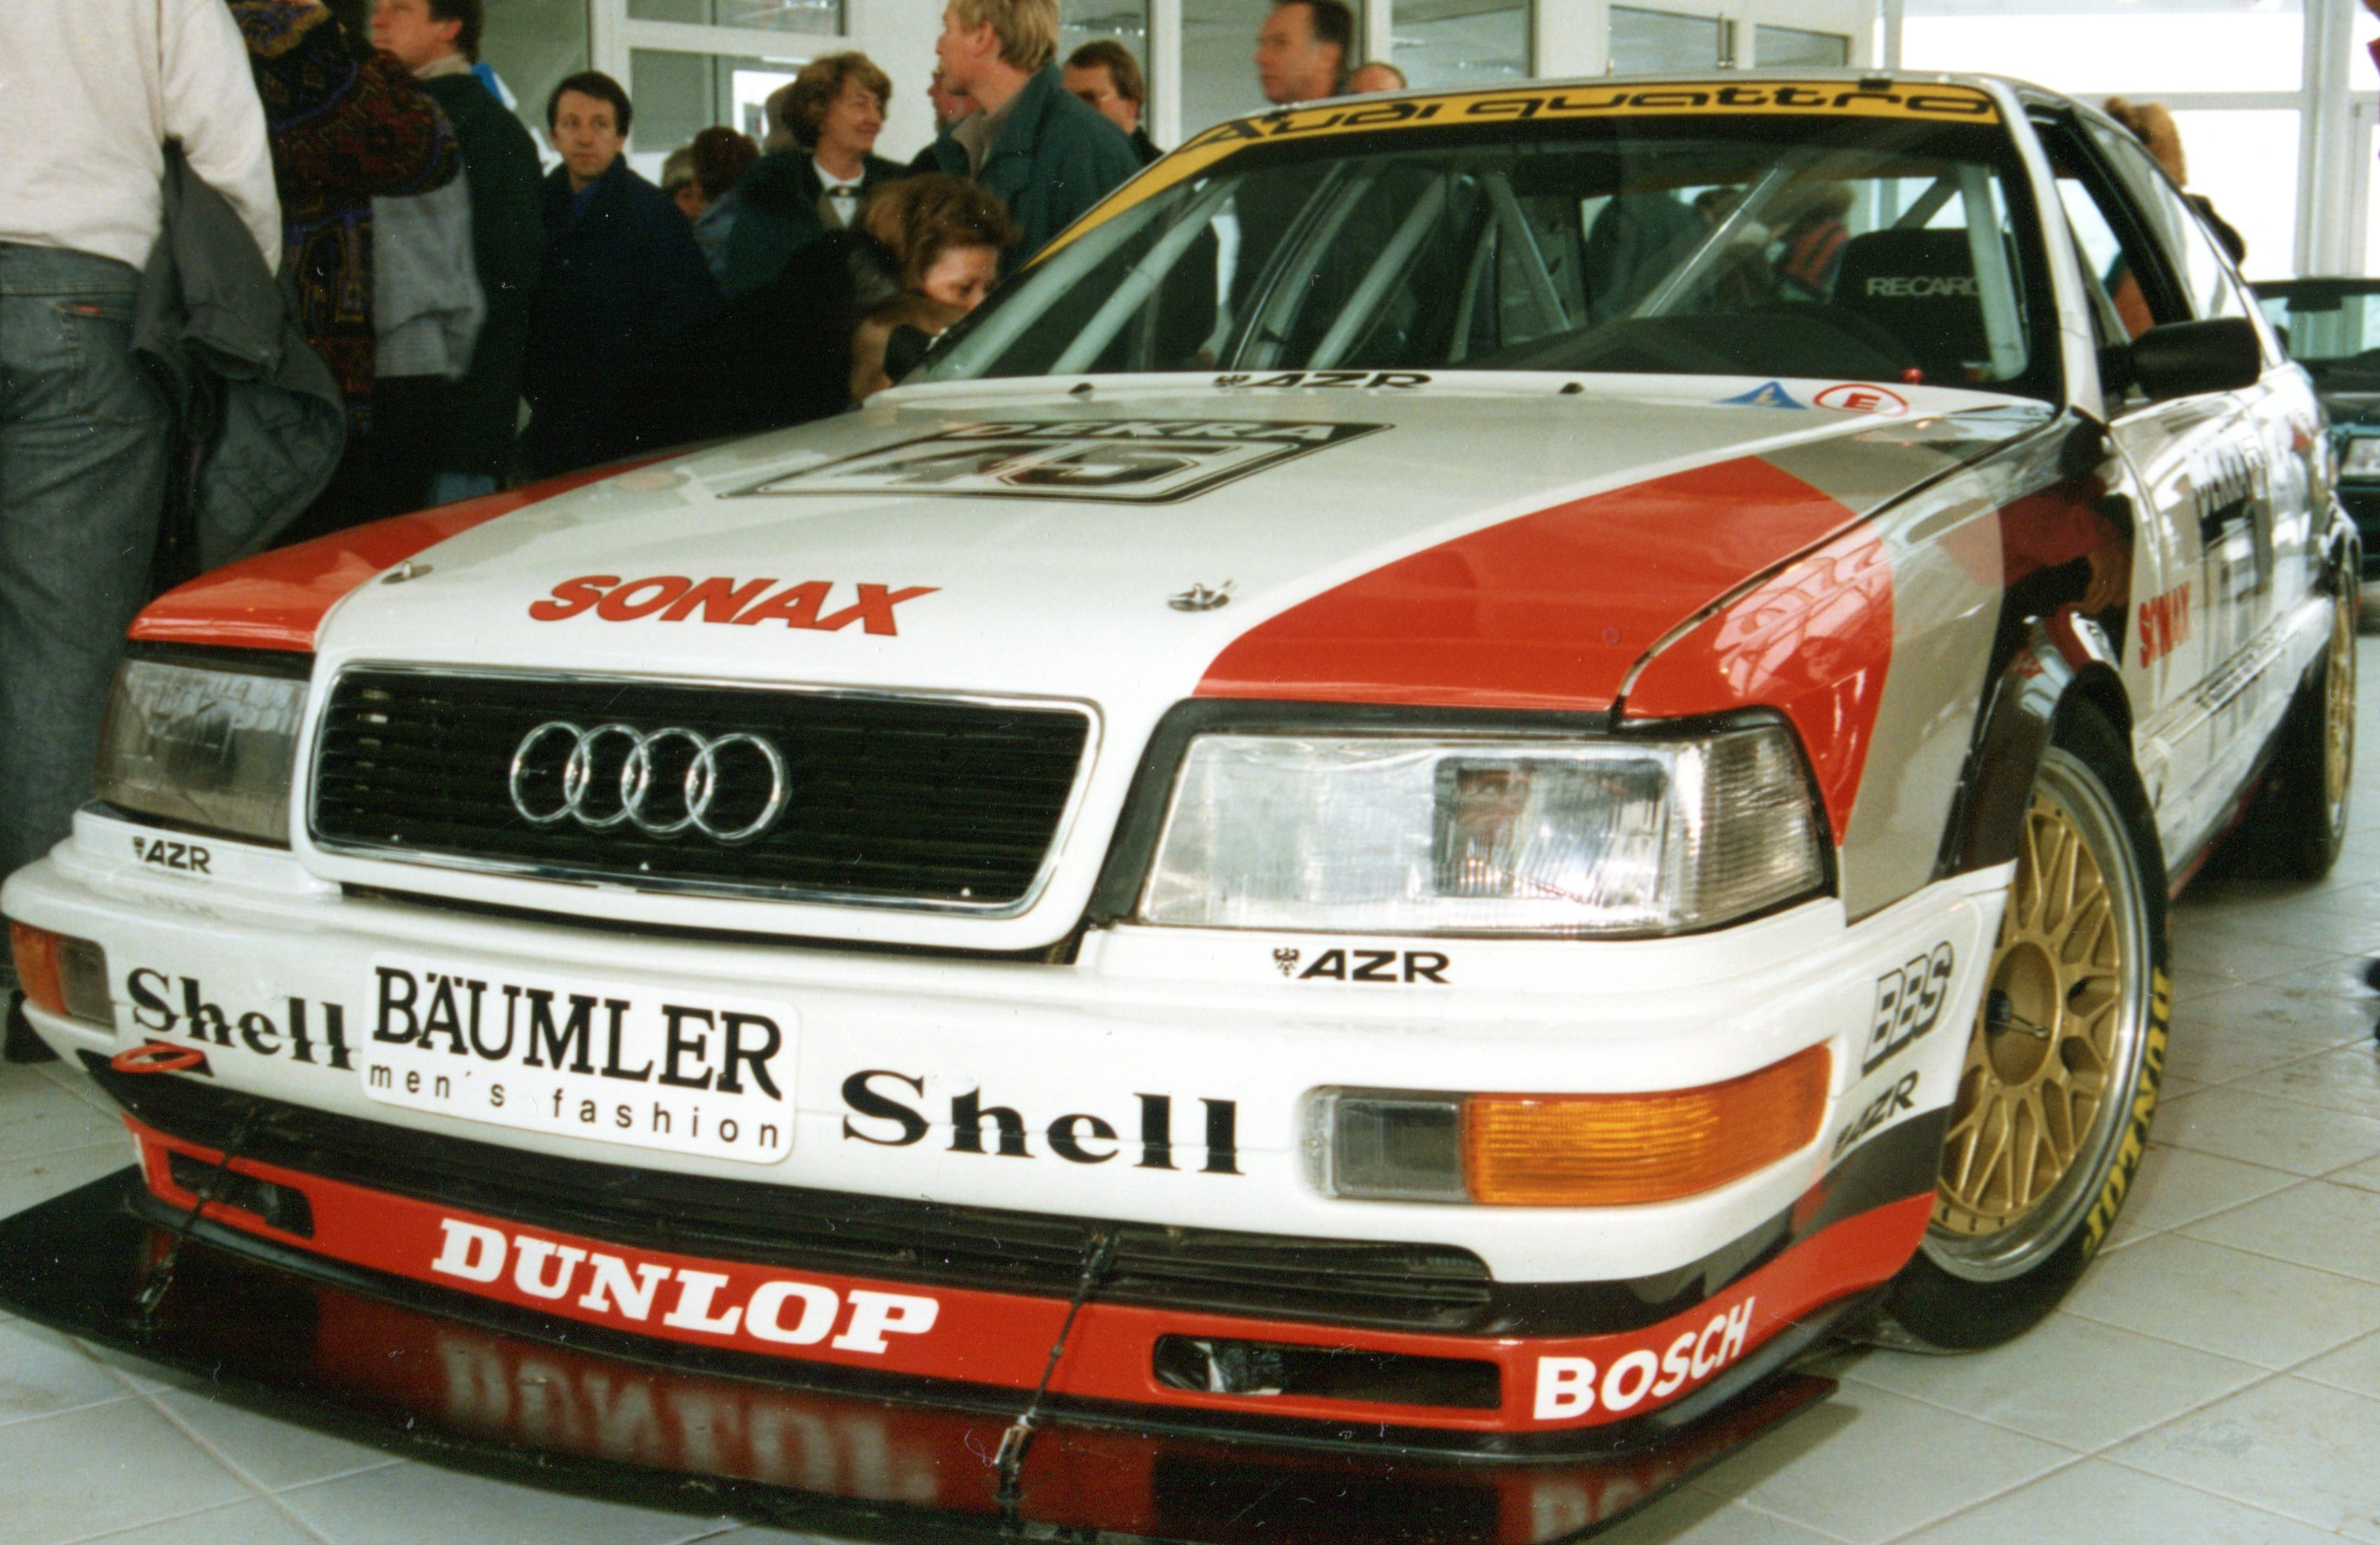 Audi V8 quattro DTM Foto: Audi Tradition